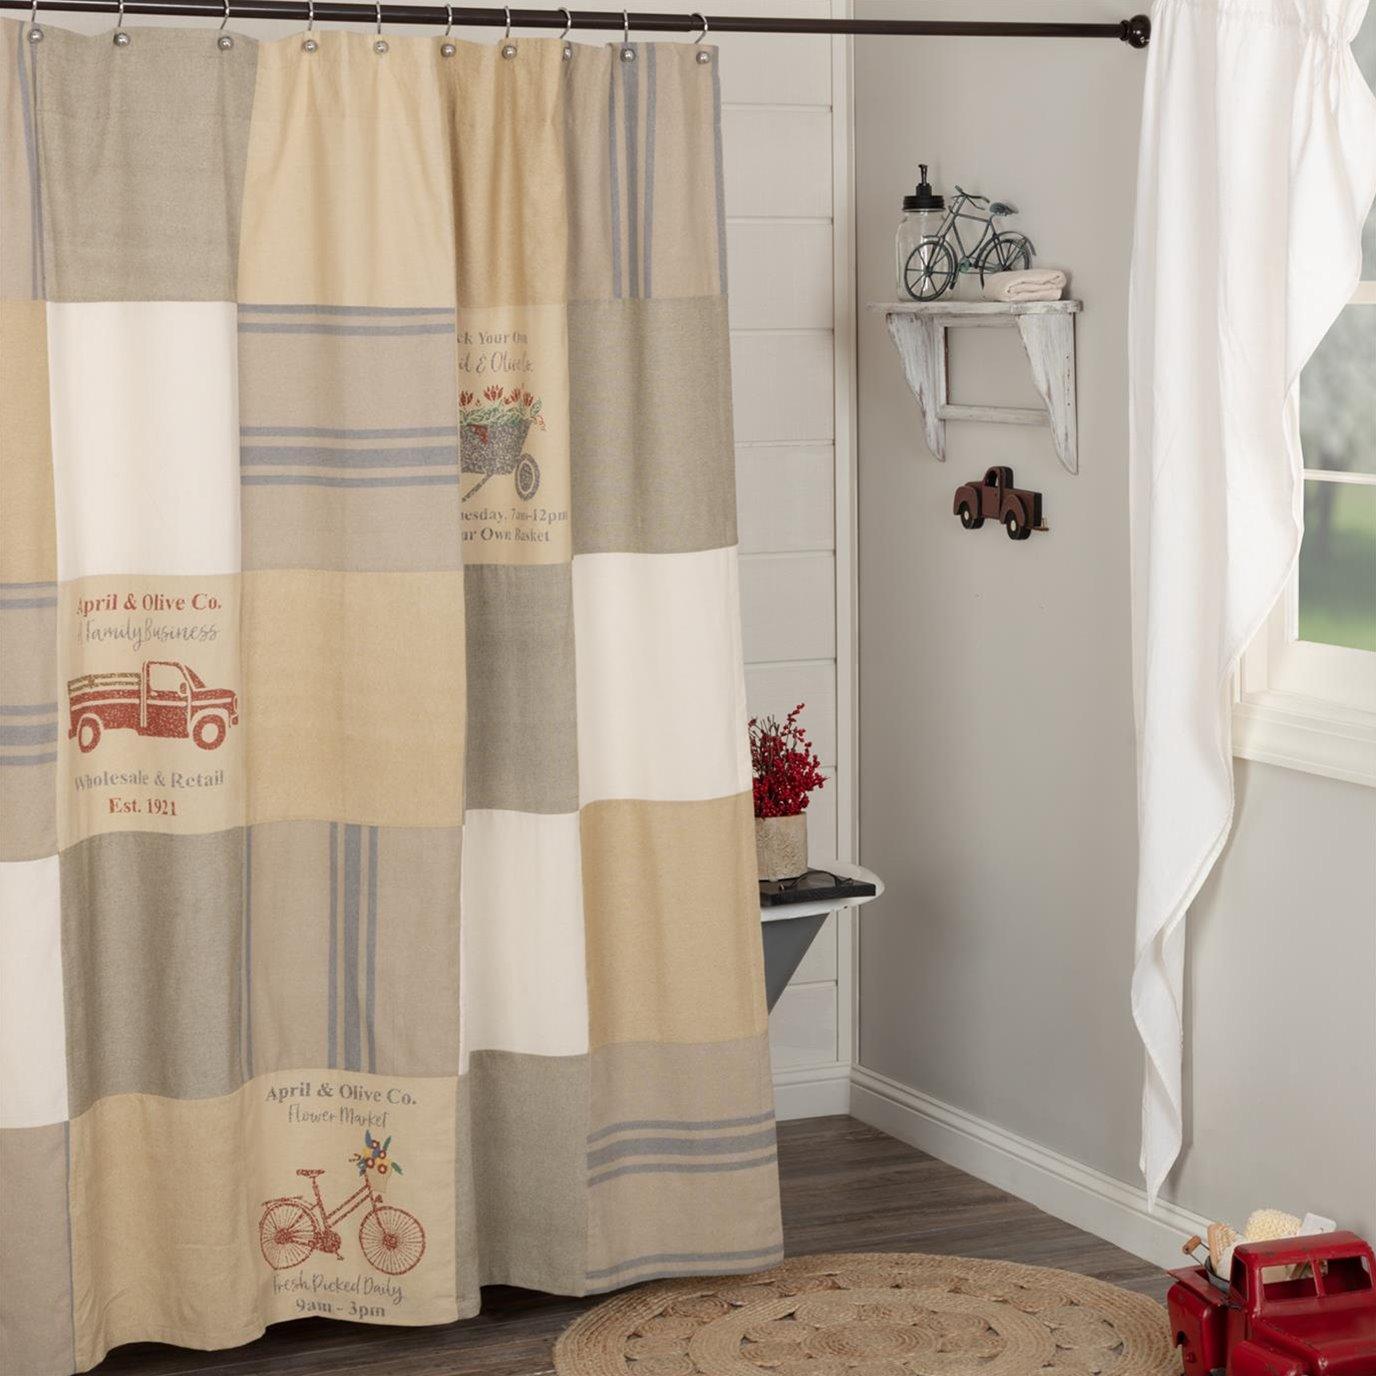 Farmer's Market Stenciled Patchwork Shower Curtain 72x72